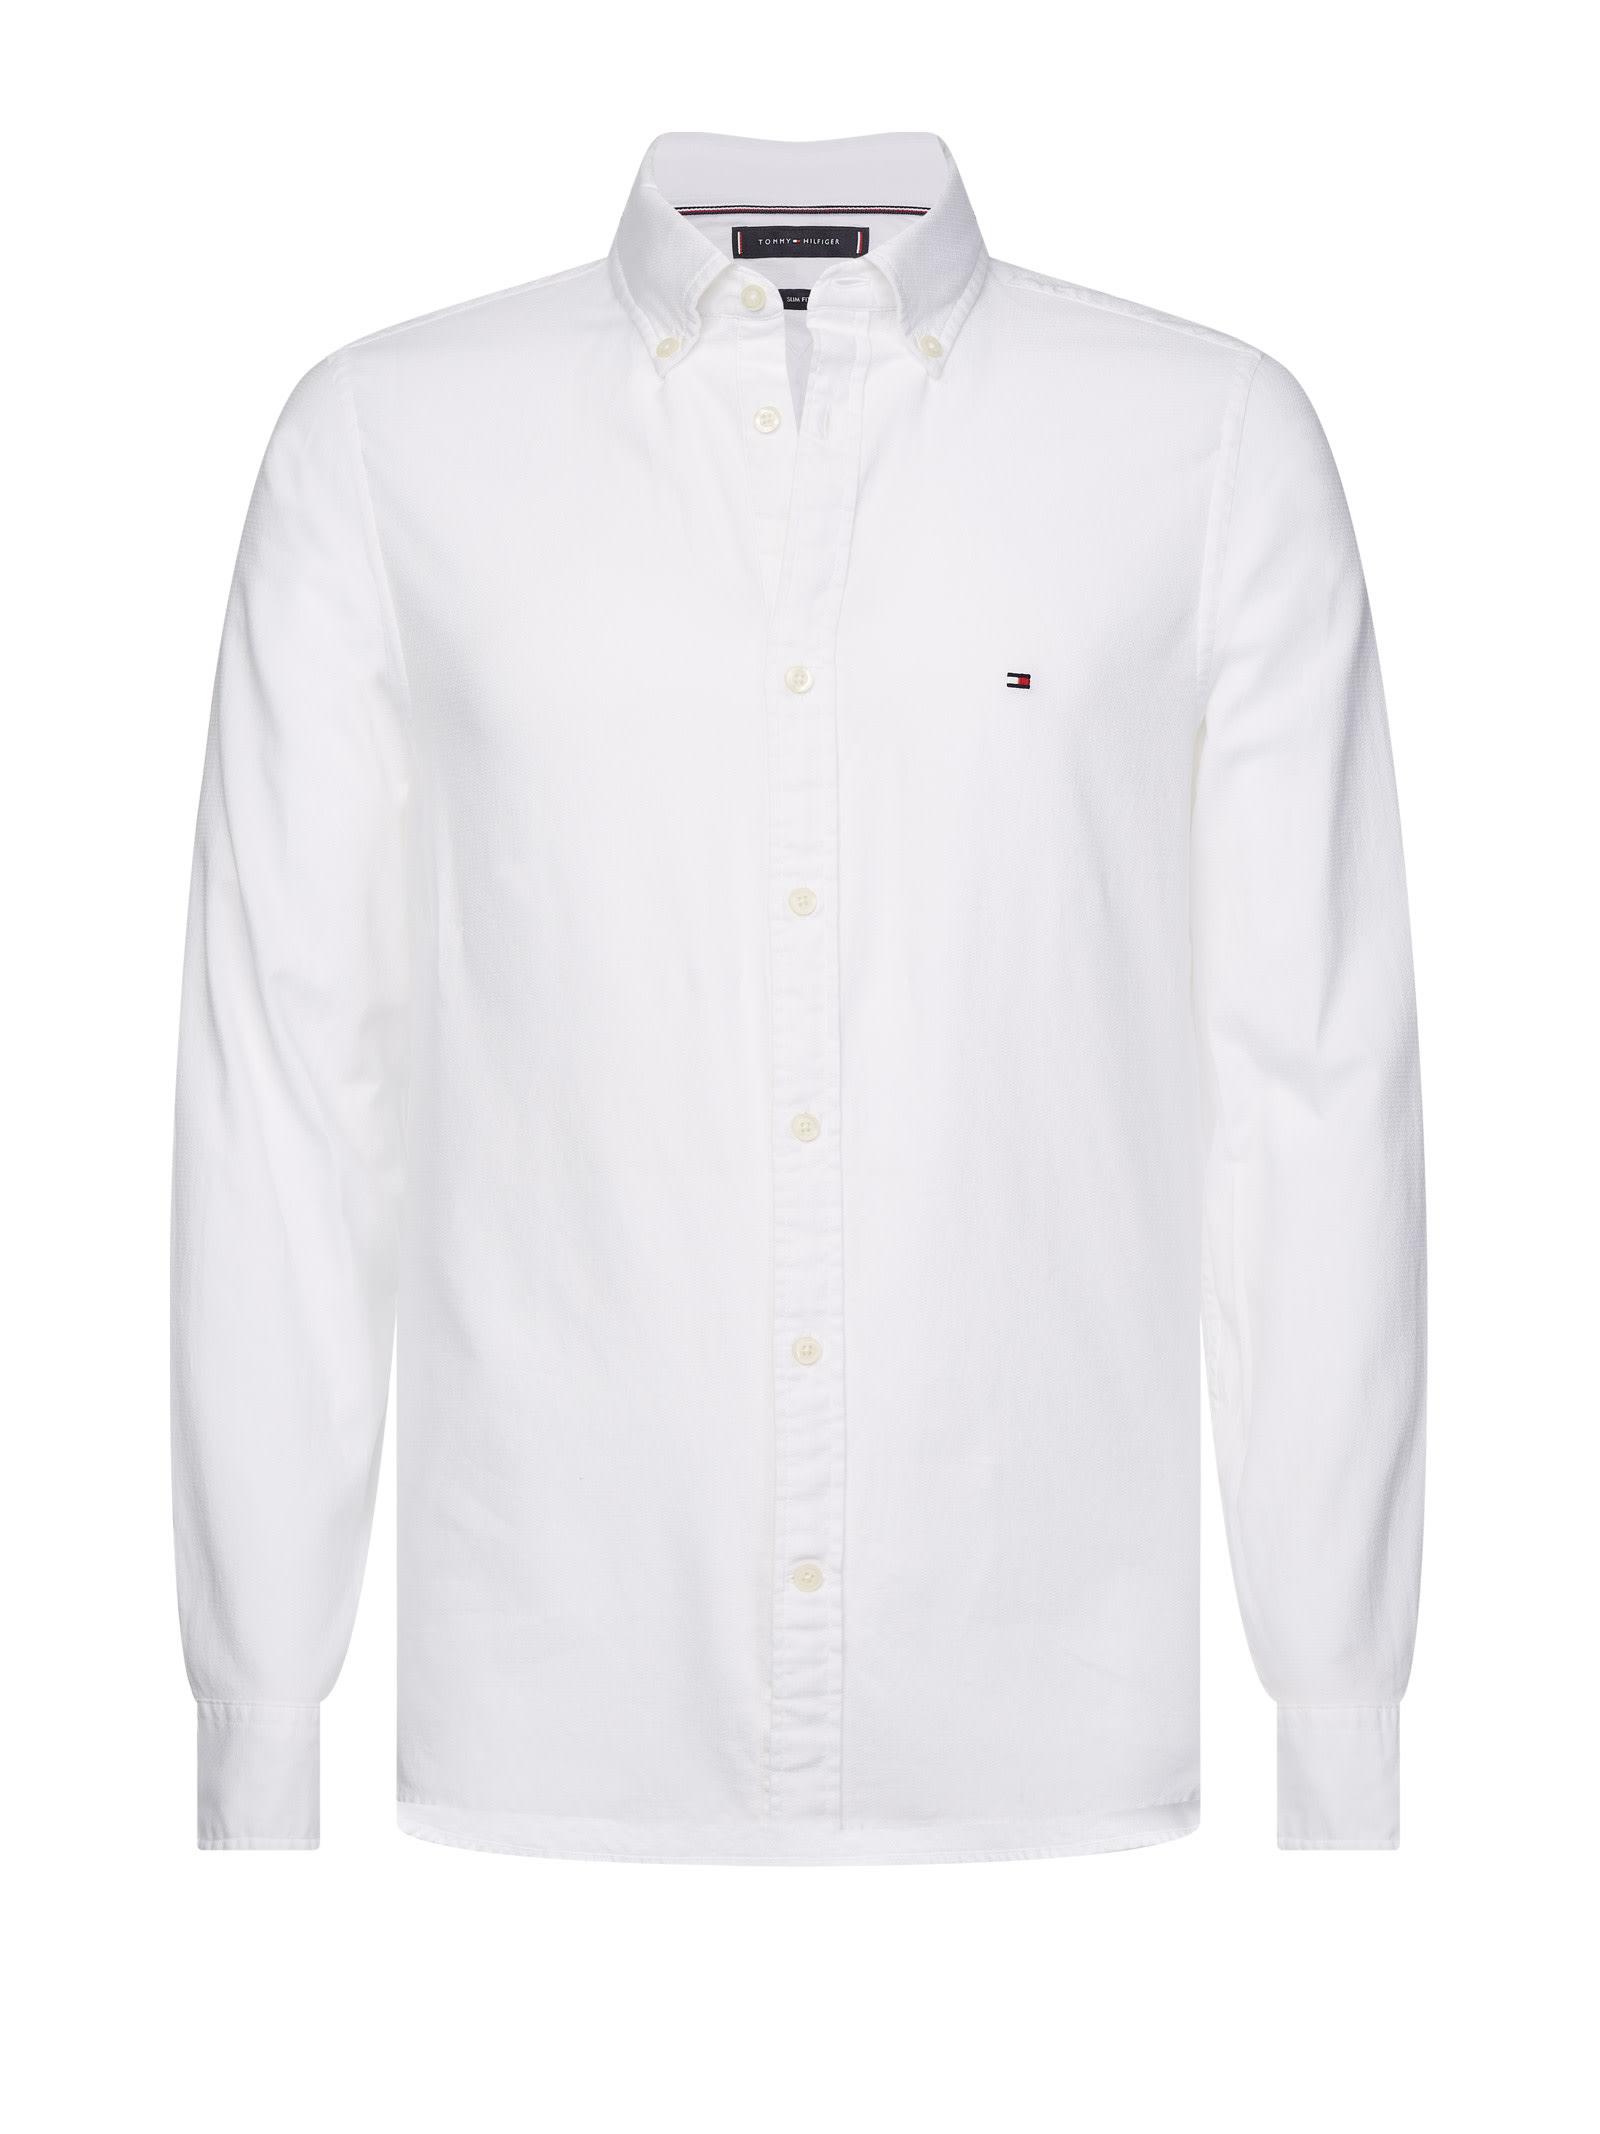 Tommy Hilfiger Tommy Hilfiger White Shirt